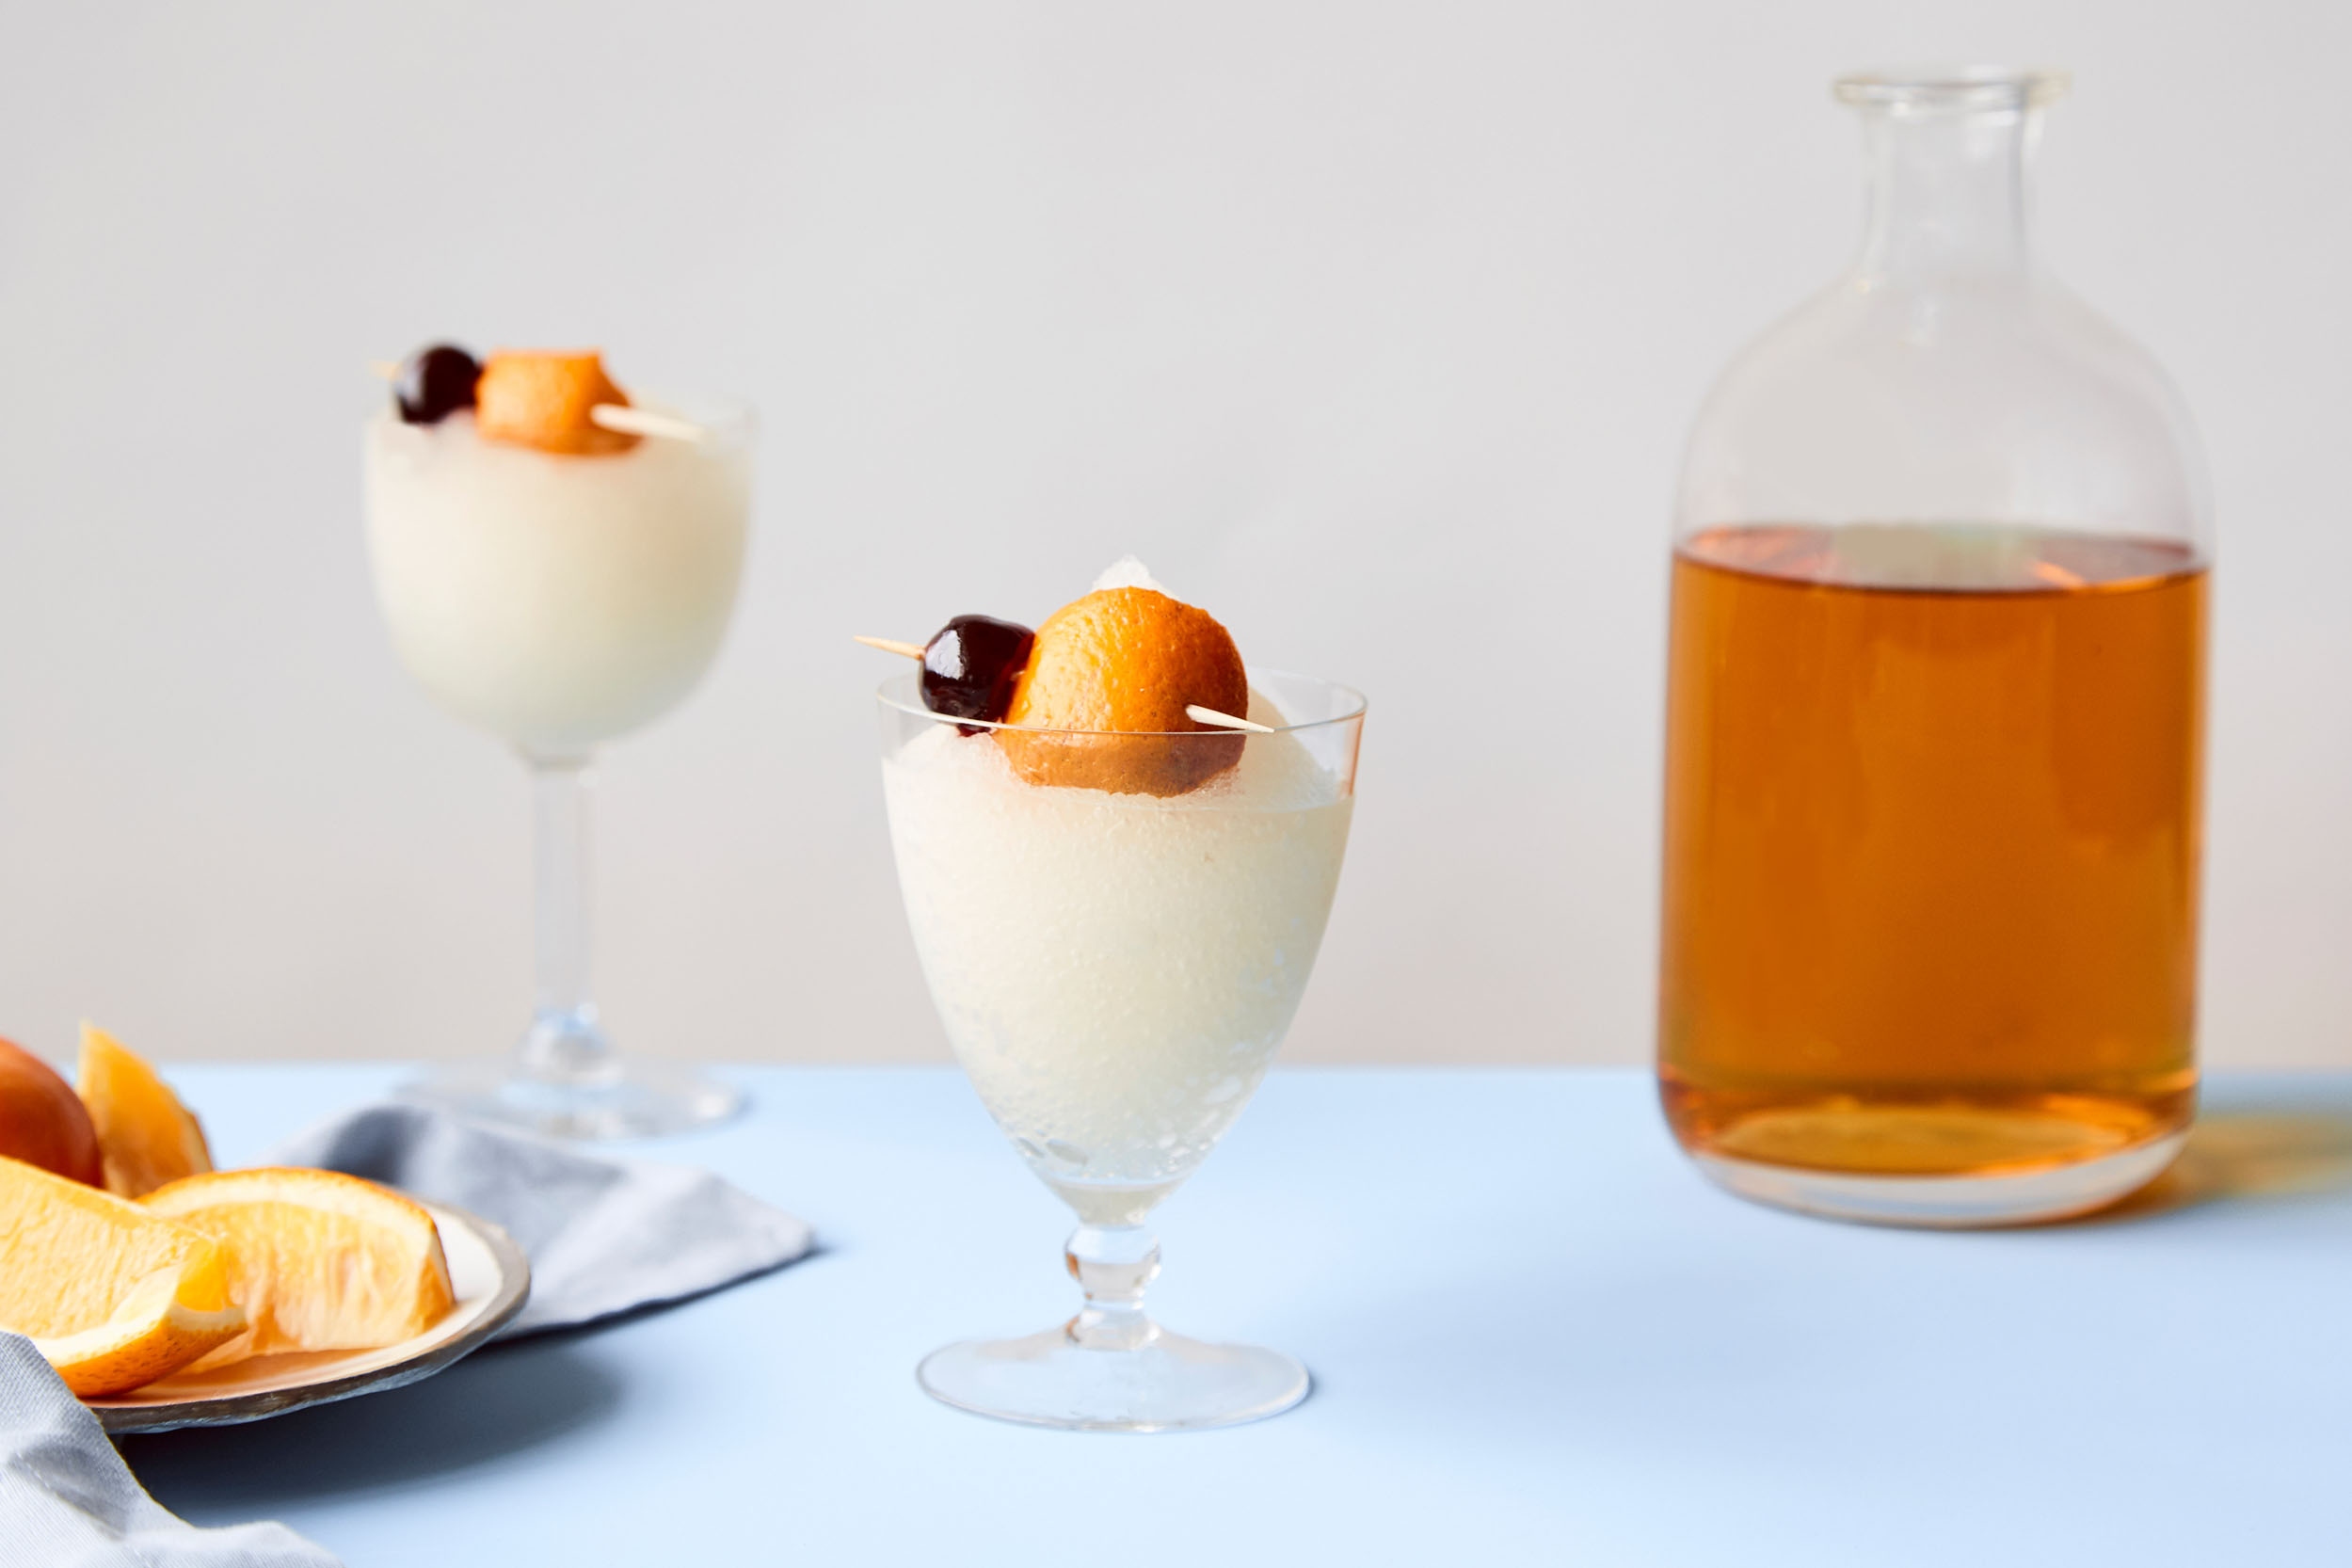 french 75 - Kelvin Frosé Blanc™ Slush Mix,Gin, Champagne